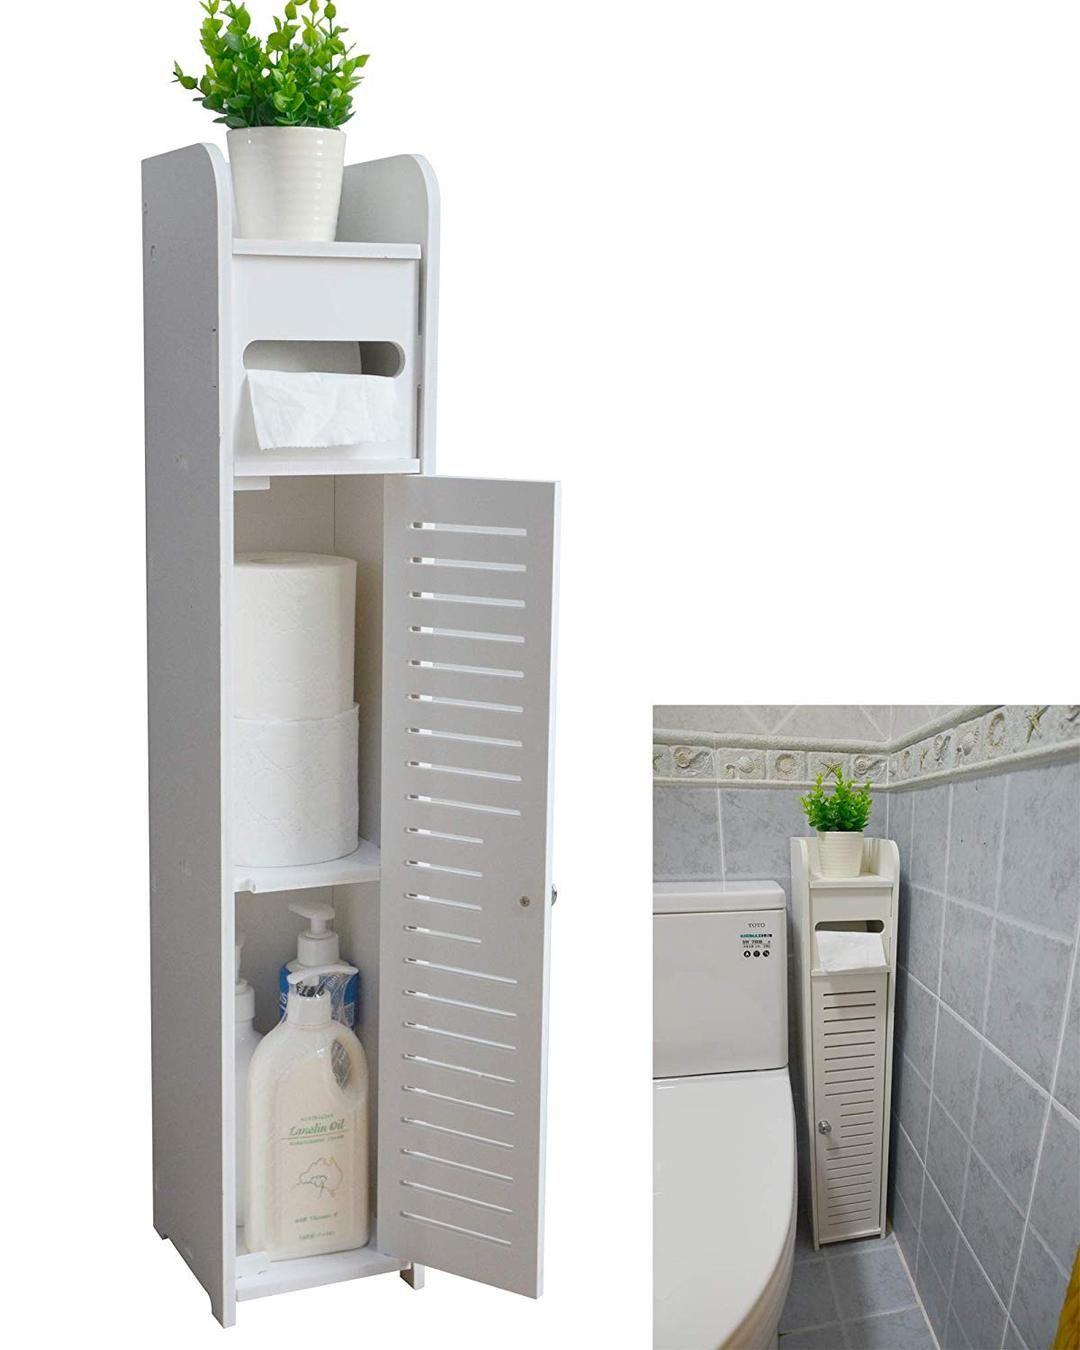 Bathroom Storage Corner Floor Vanity Cabinet Small Bathroom Storage Cabinet Narrow Bathroom Cabinet Narrow Bathroom Storage